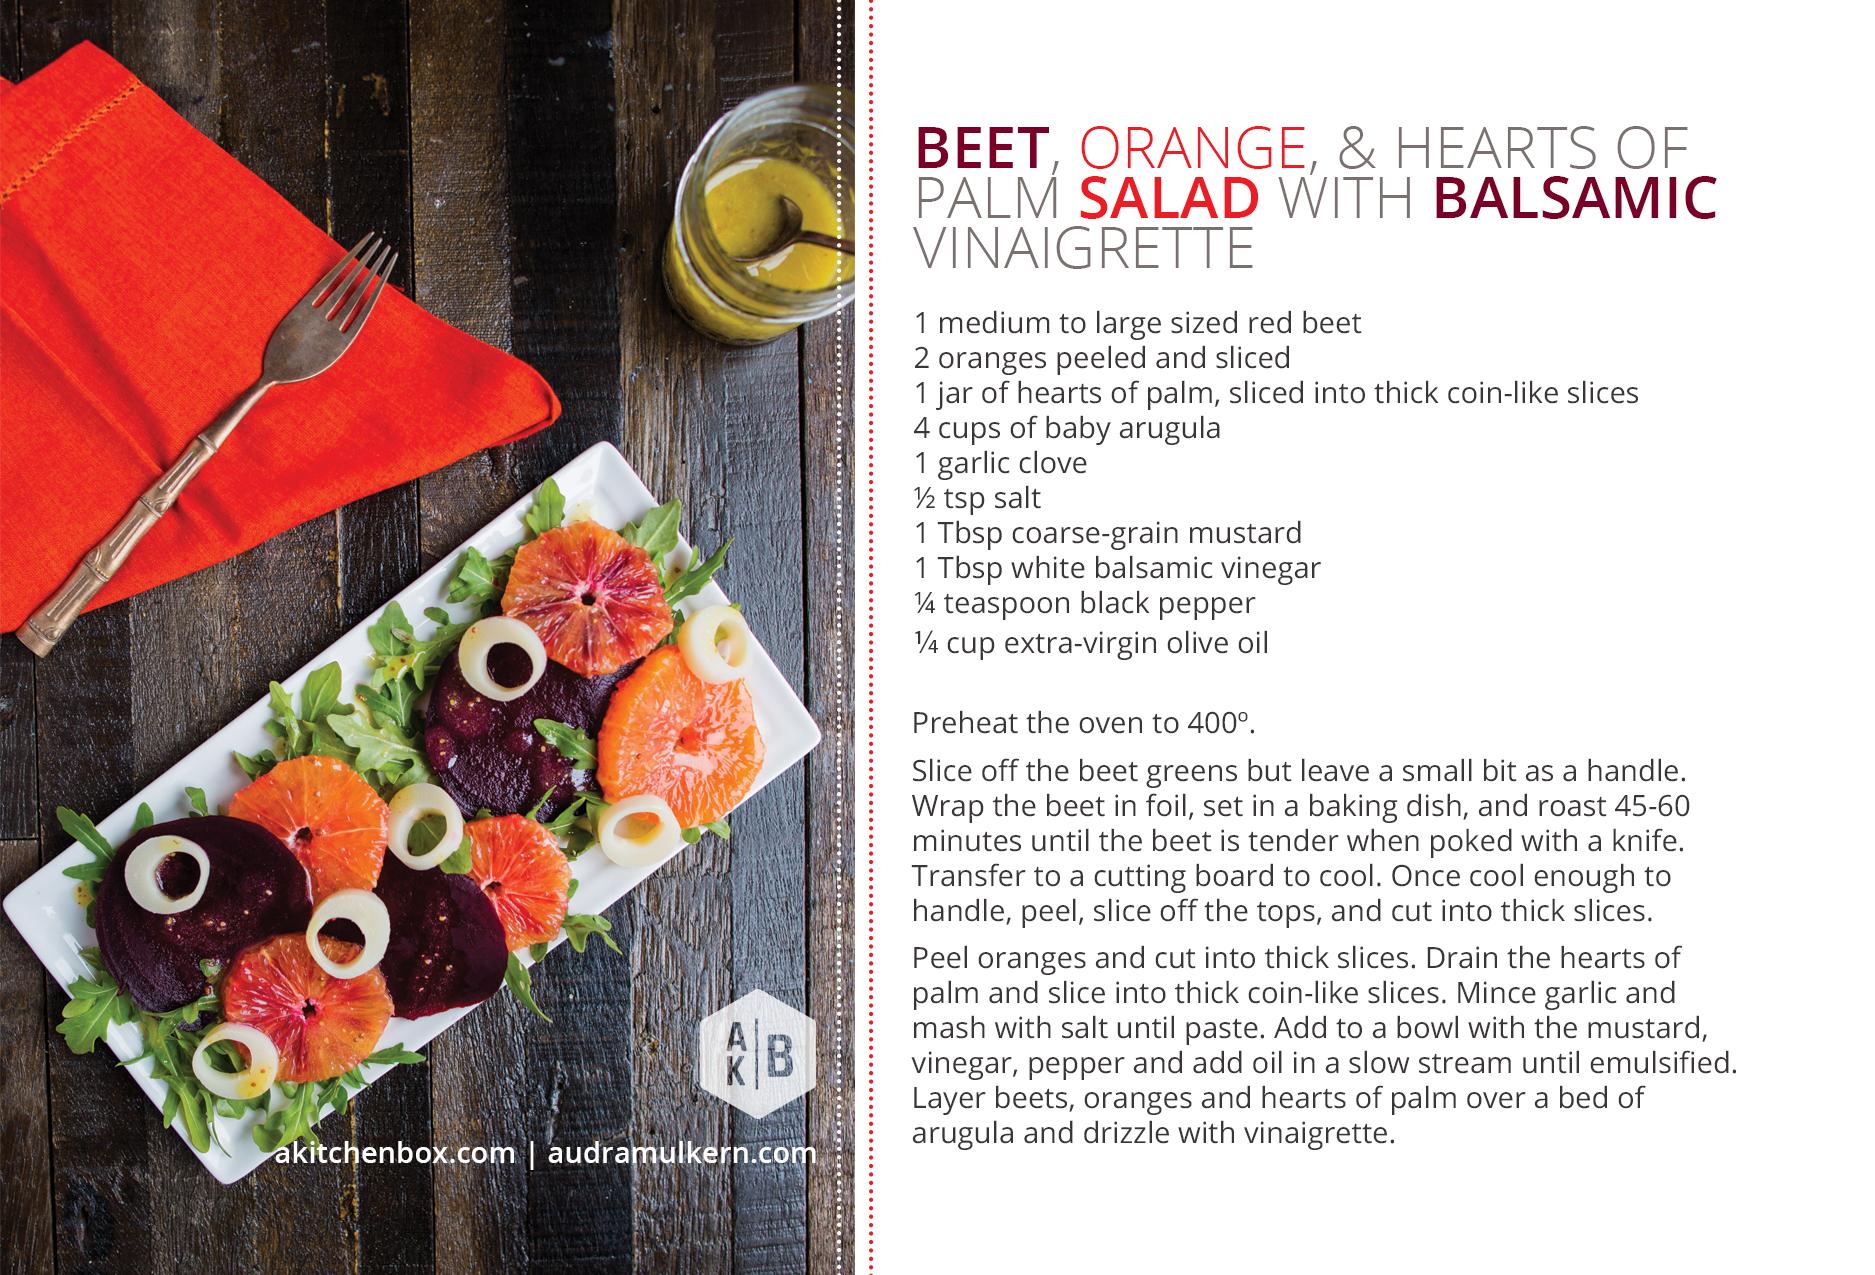 02 BACK Beet Salad + Image.jpg